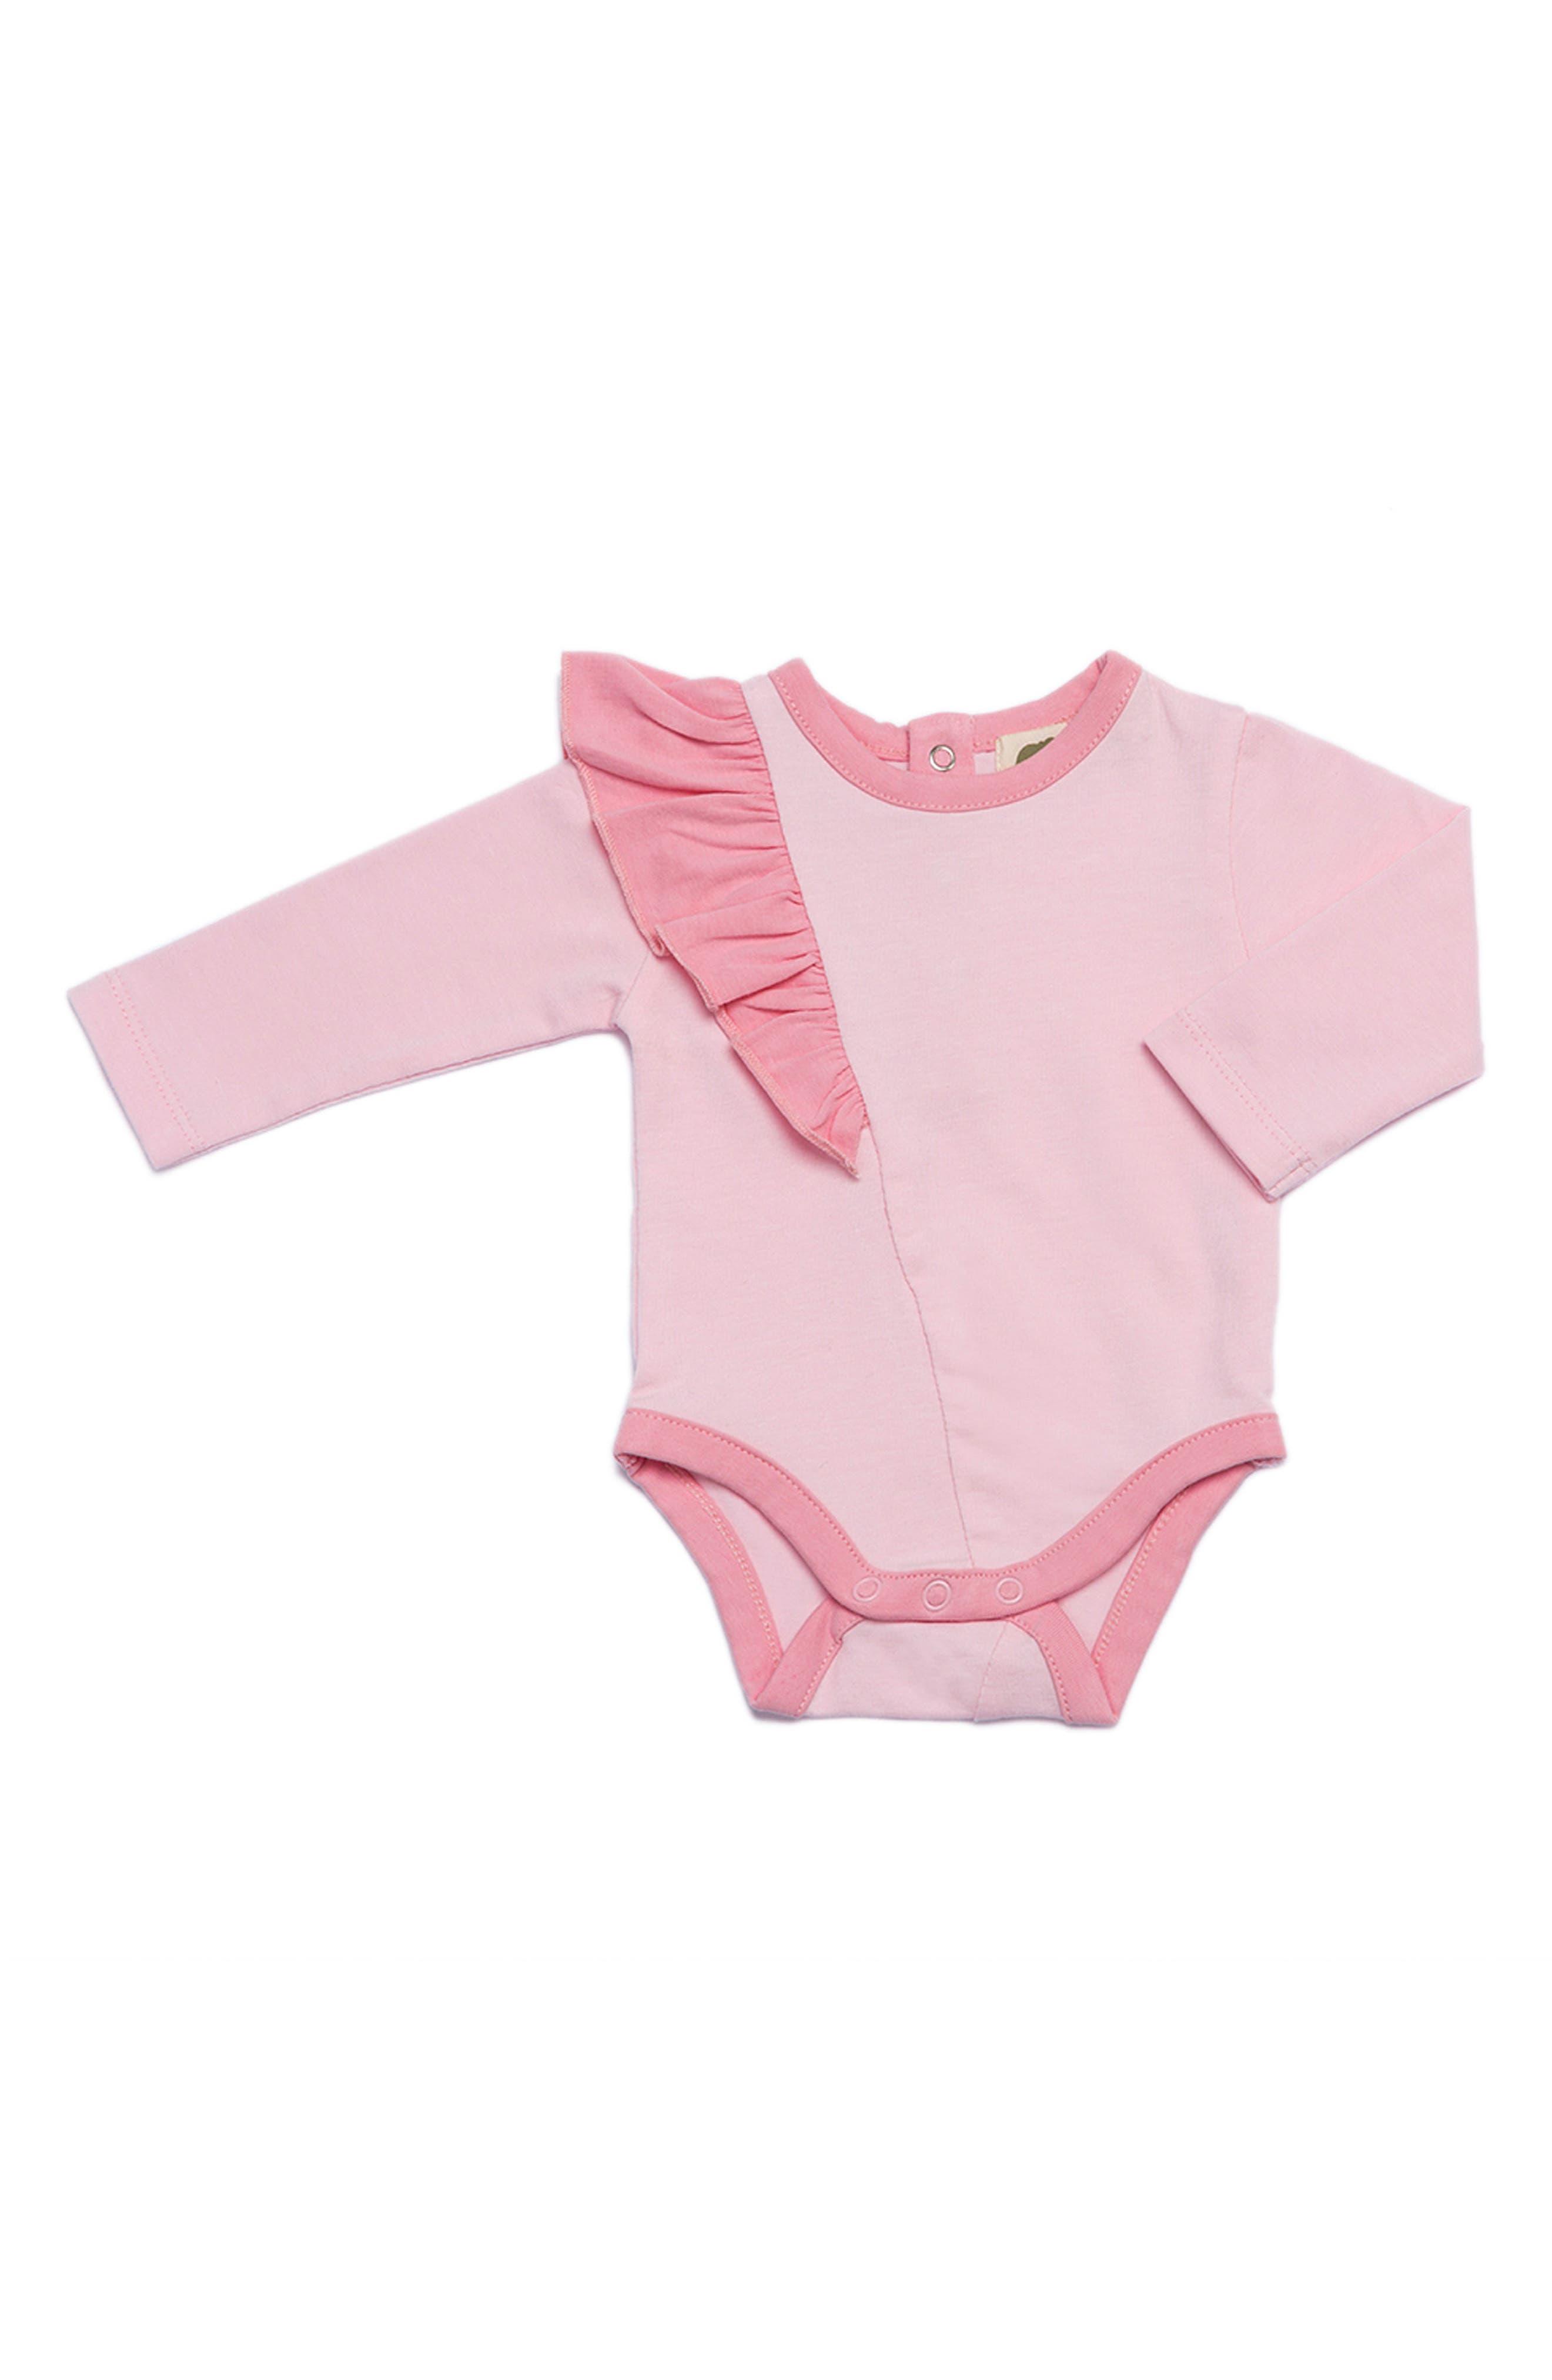 Monica + Andy Ruffle Organic Cotton Bodysuit (Baby Girls)